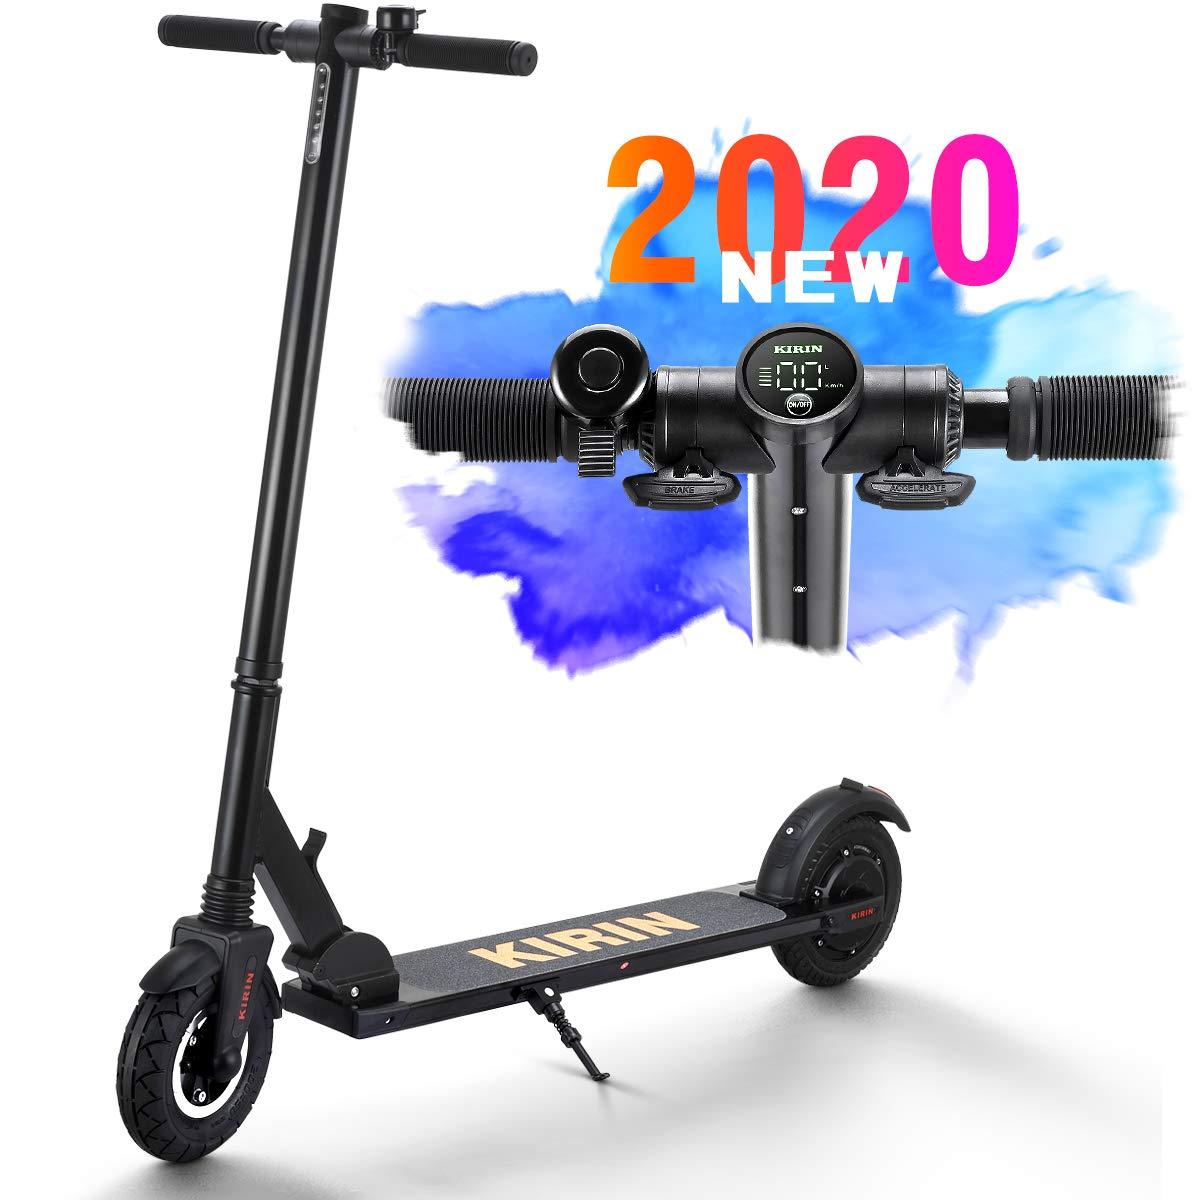 urbetter Patinetes eléctricos Ultraligeros Scooter Plegable E-Scooter para Adultos 25 kmh Neumáticos sólidos de 8 Pulgadas, Apto para Adultos y ...